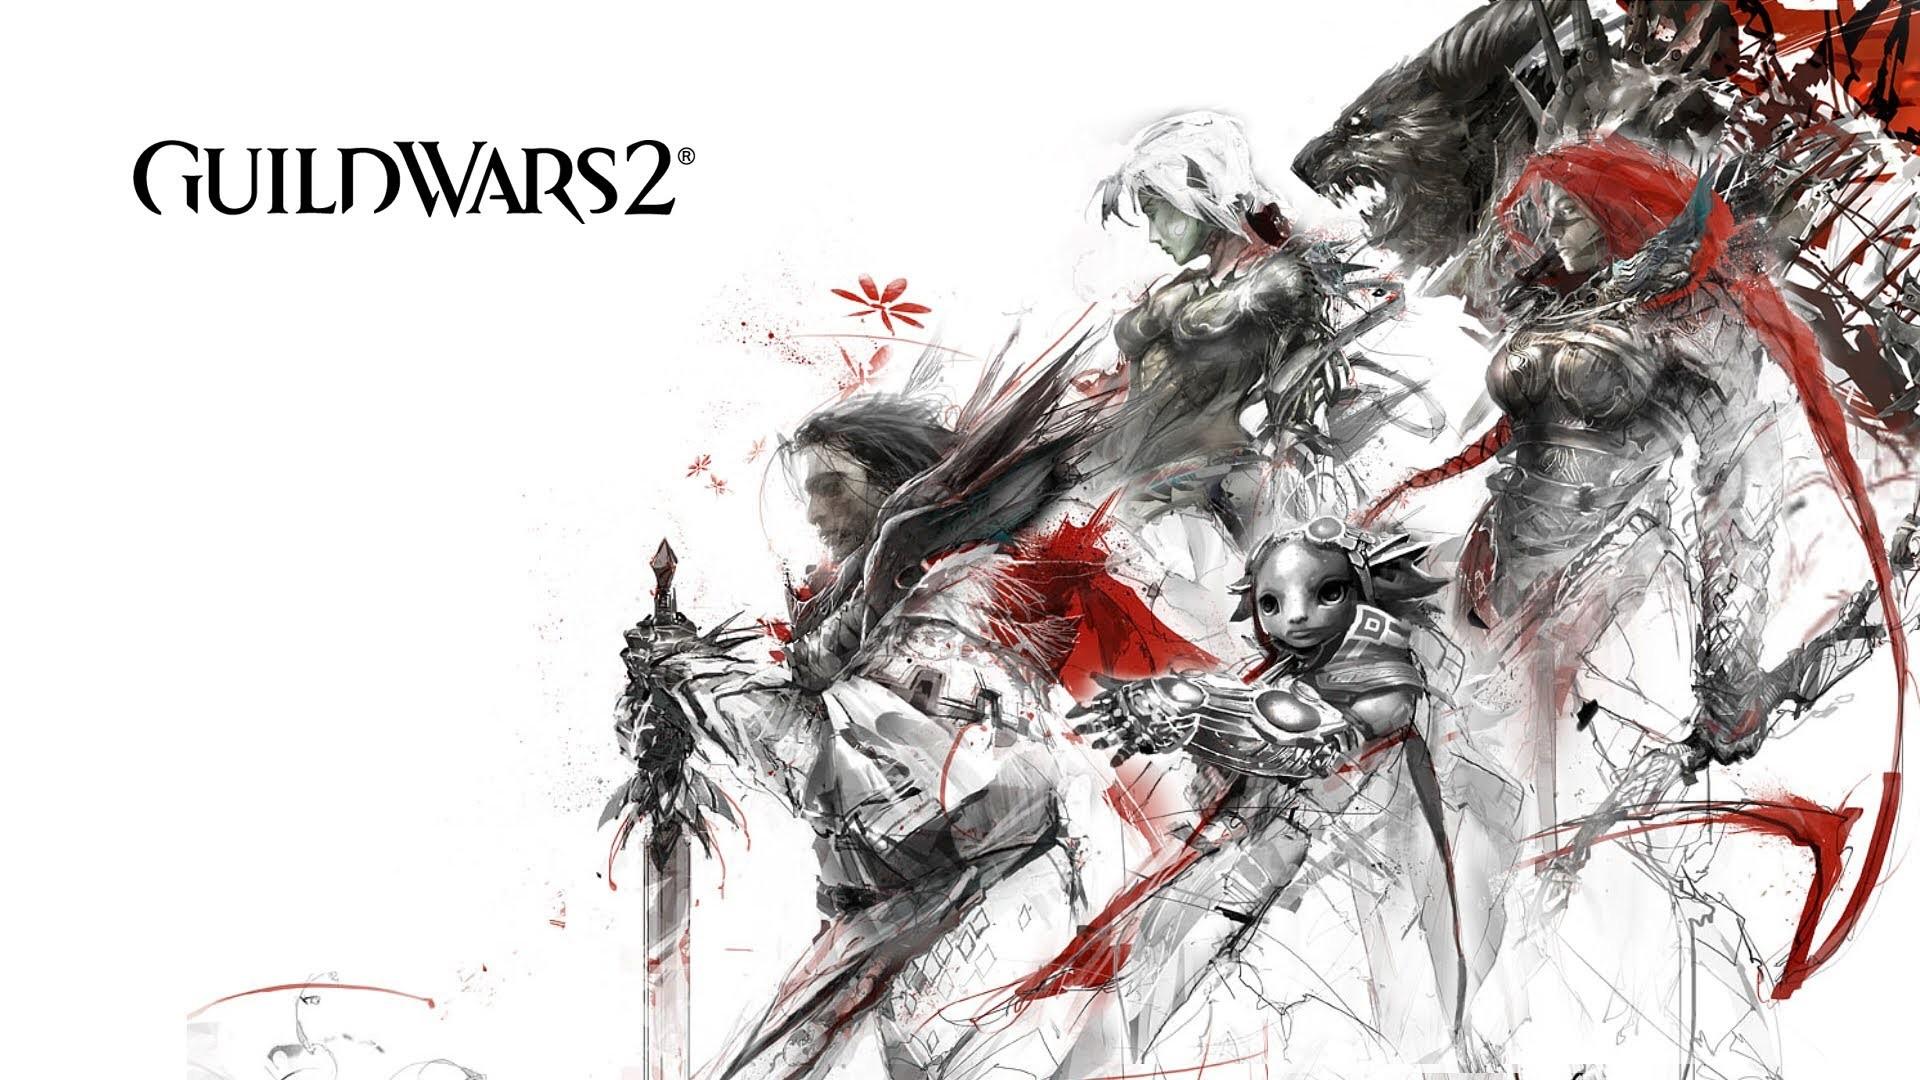 1920x1080 Guild Wars 2 HD